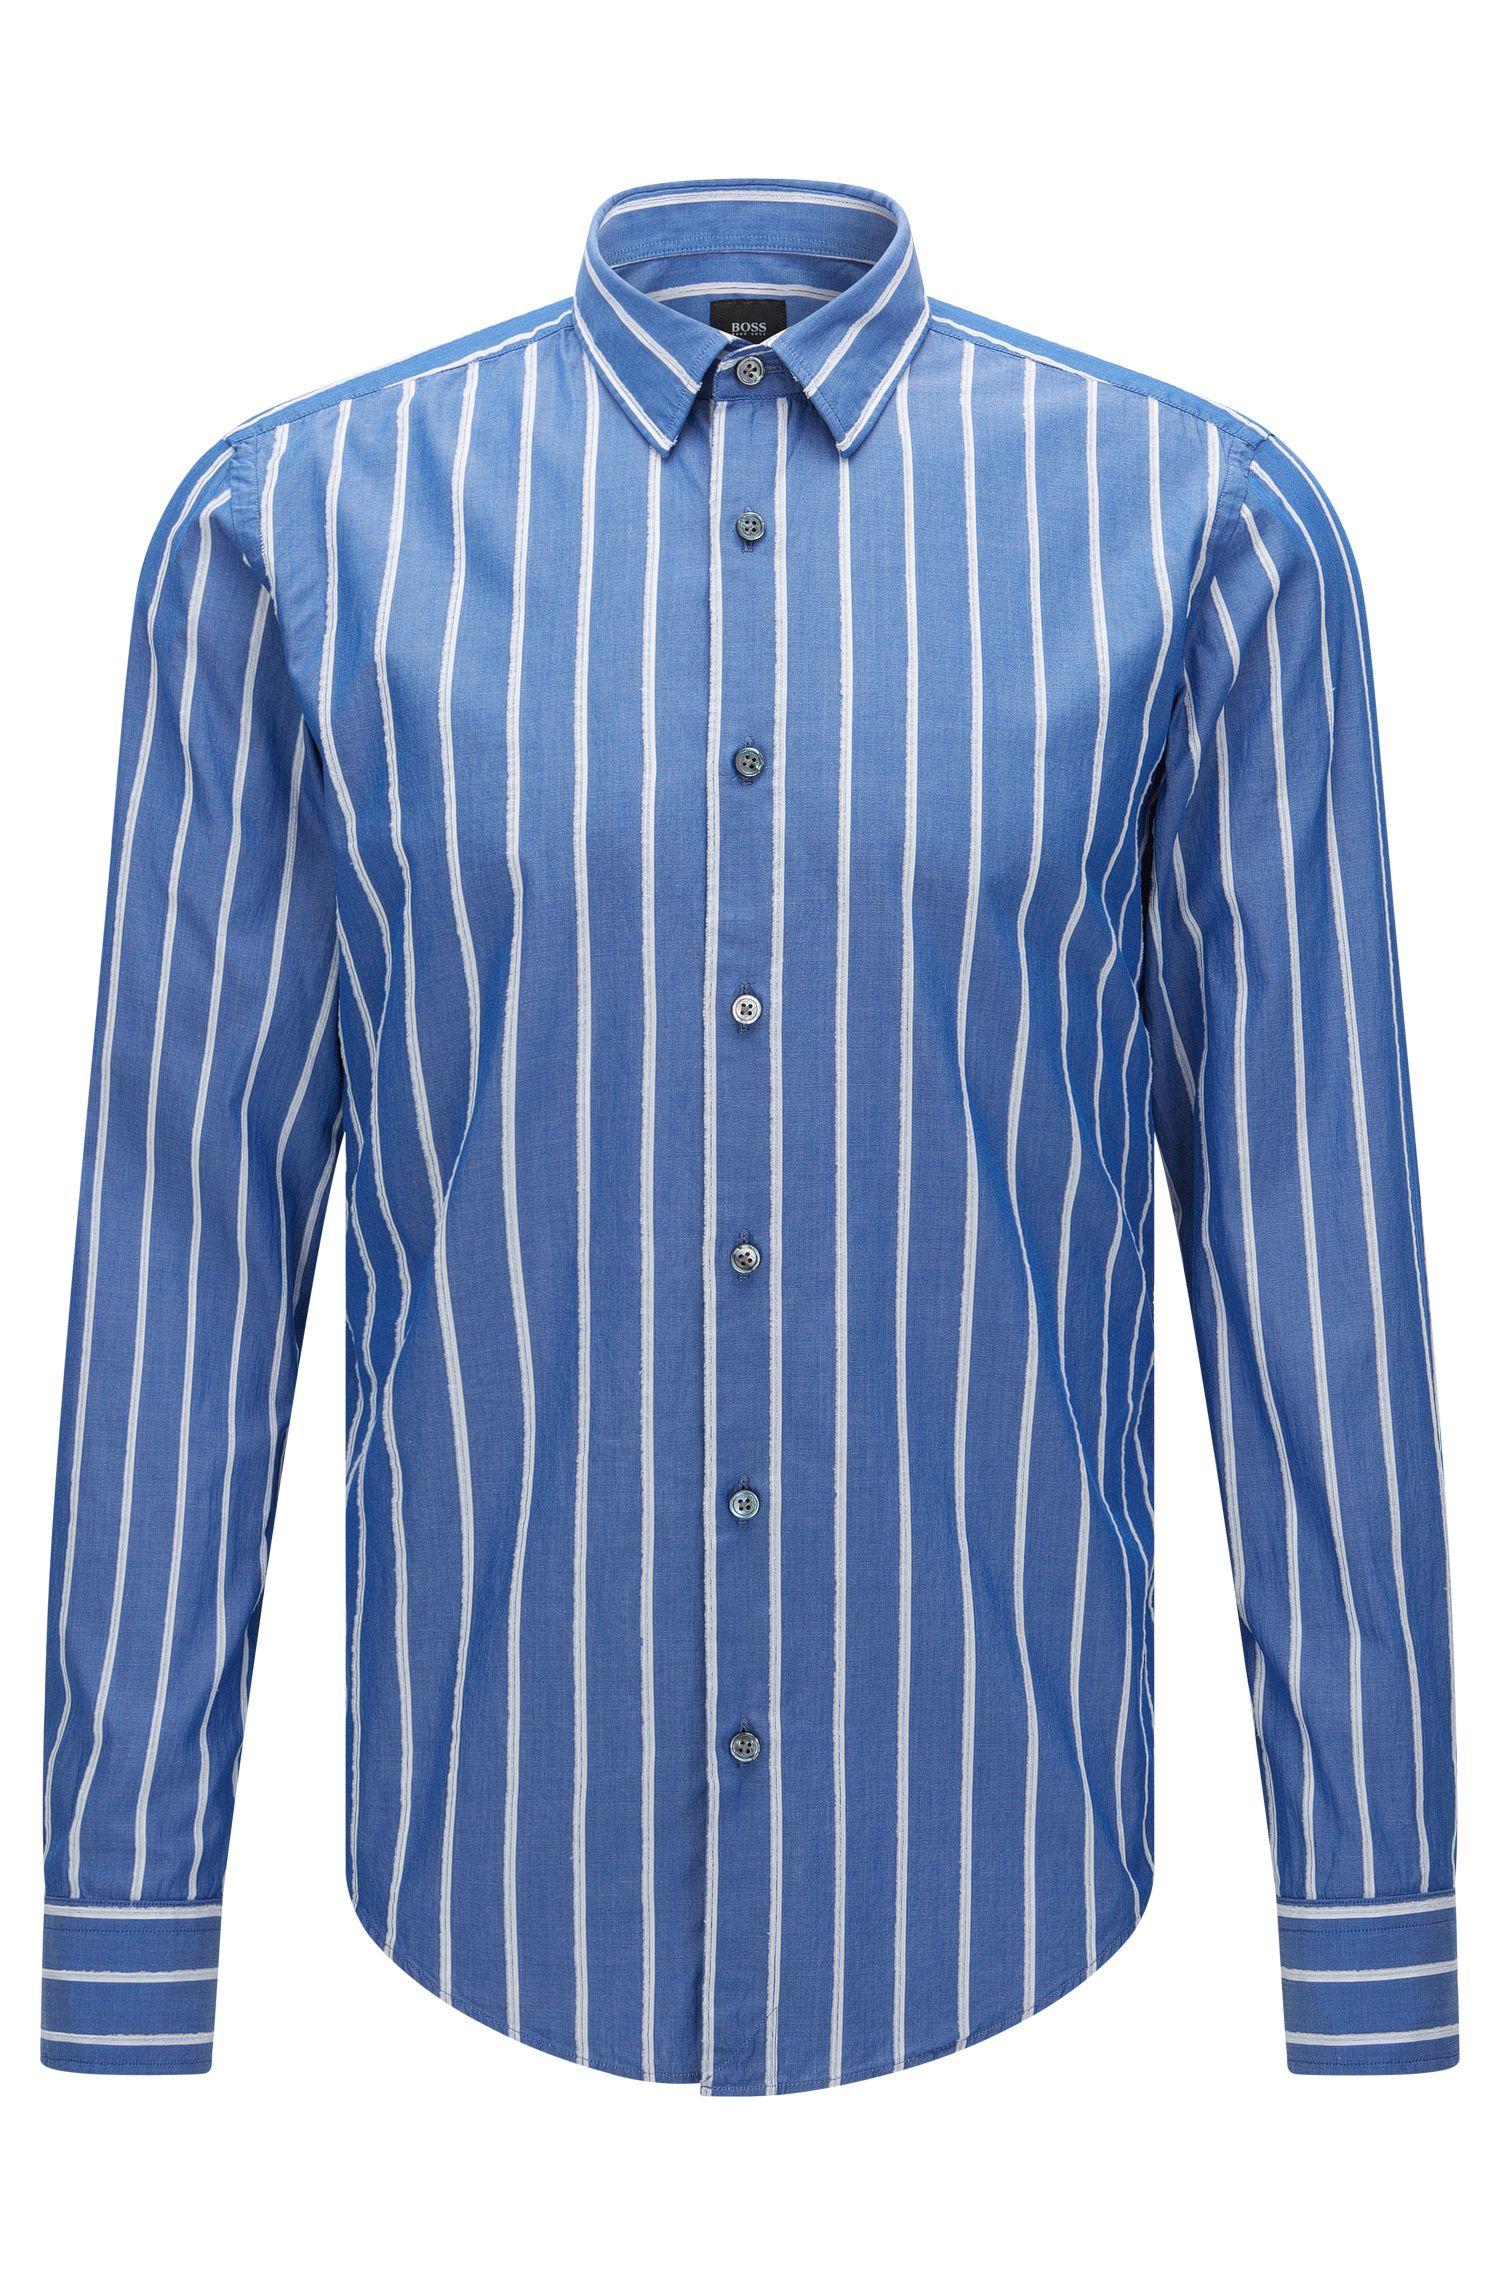 'T-Riccardo F'   Slim Fit, Italian Cotton Button Down Shirt